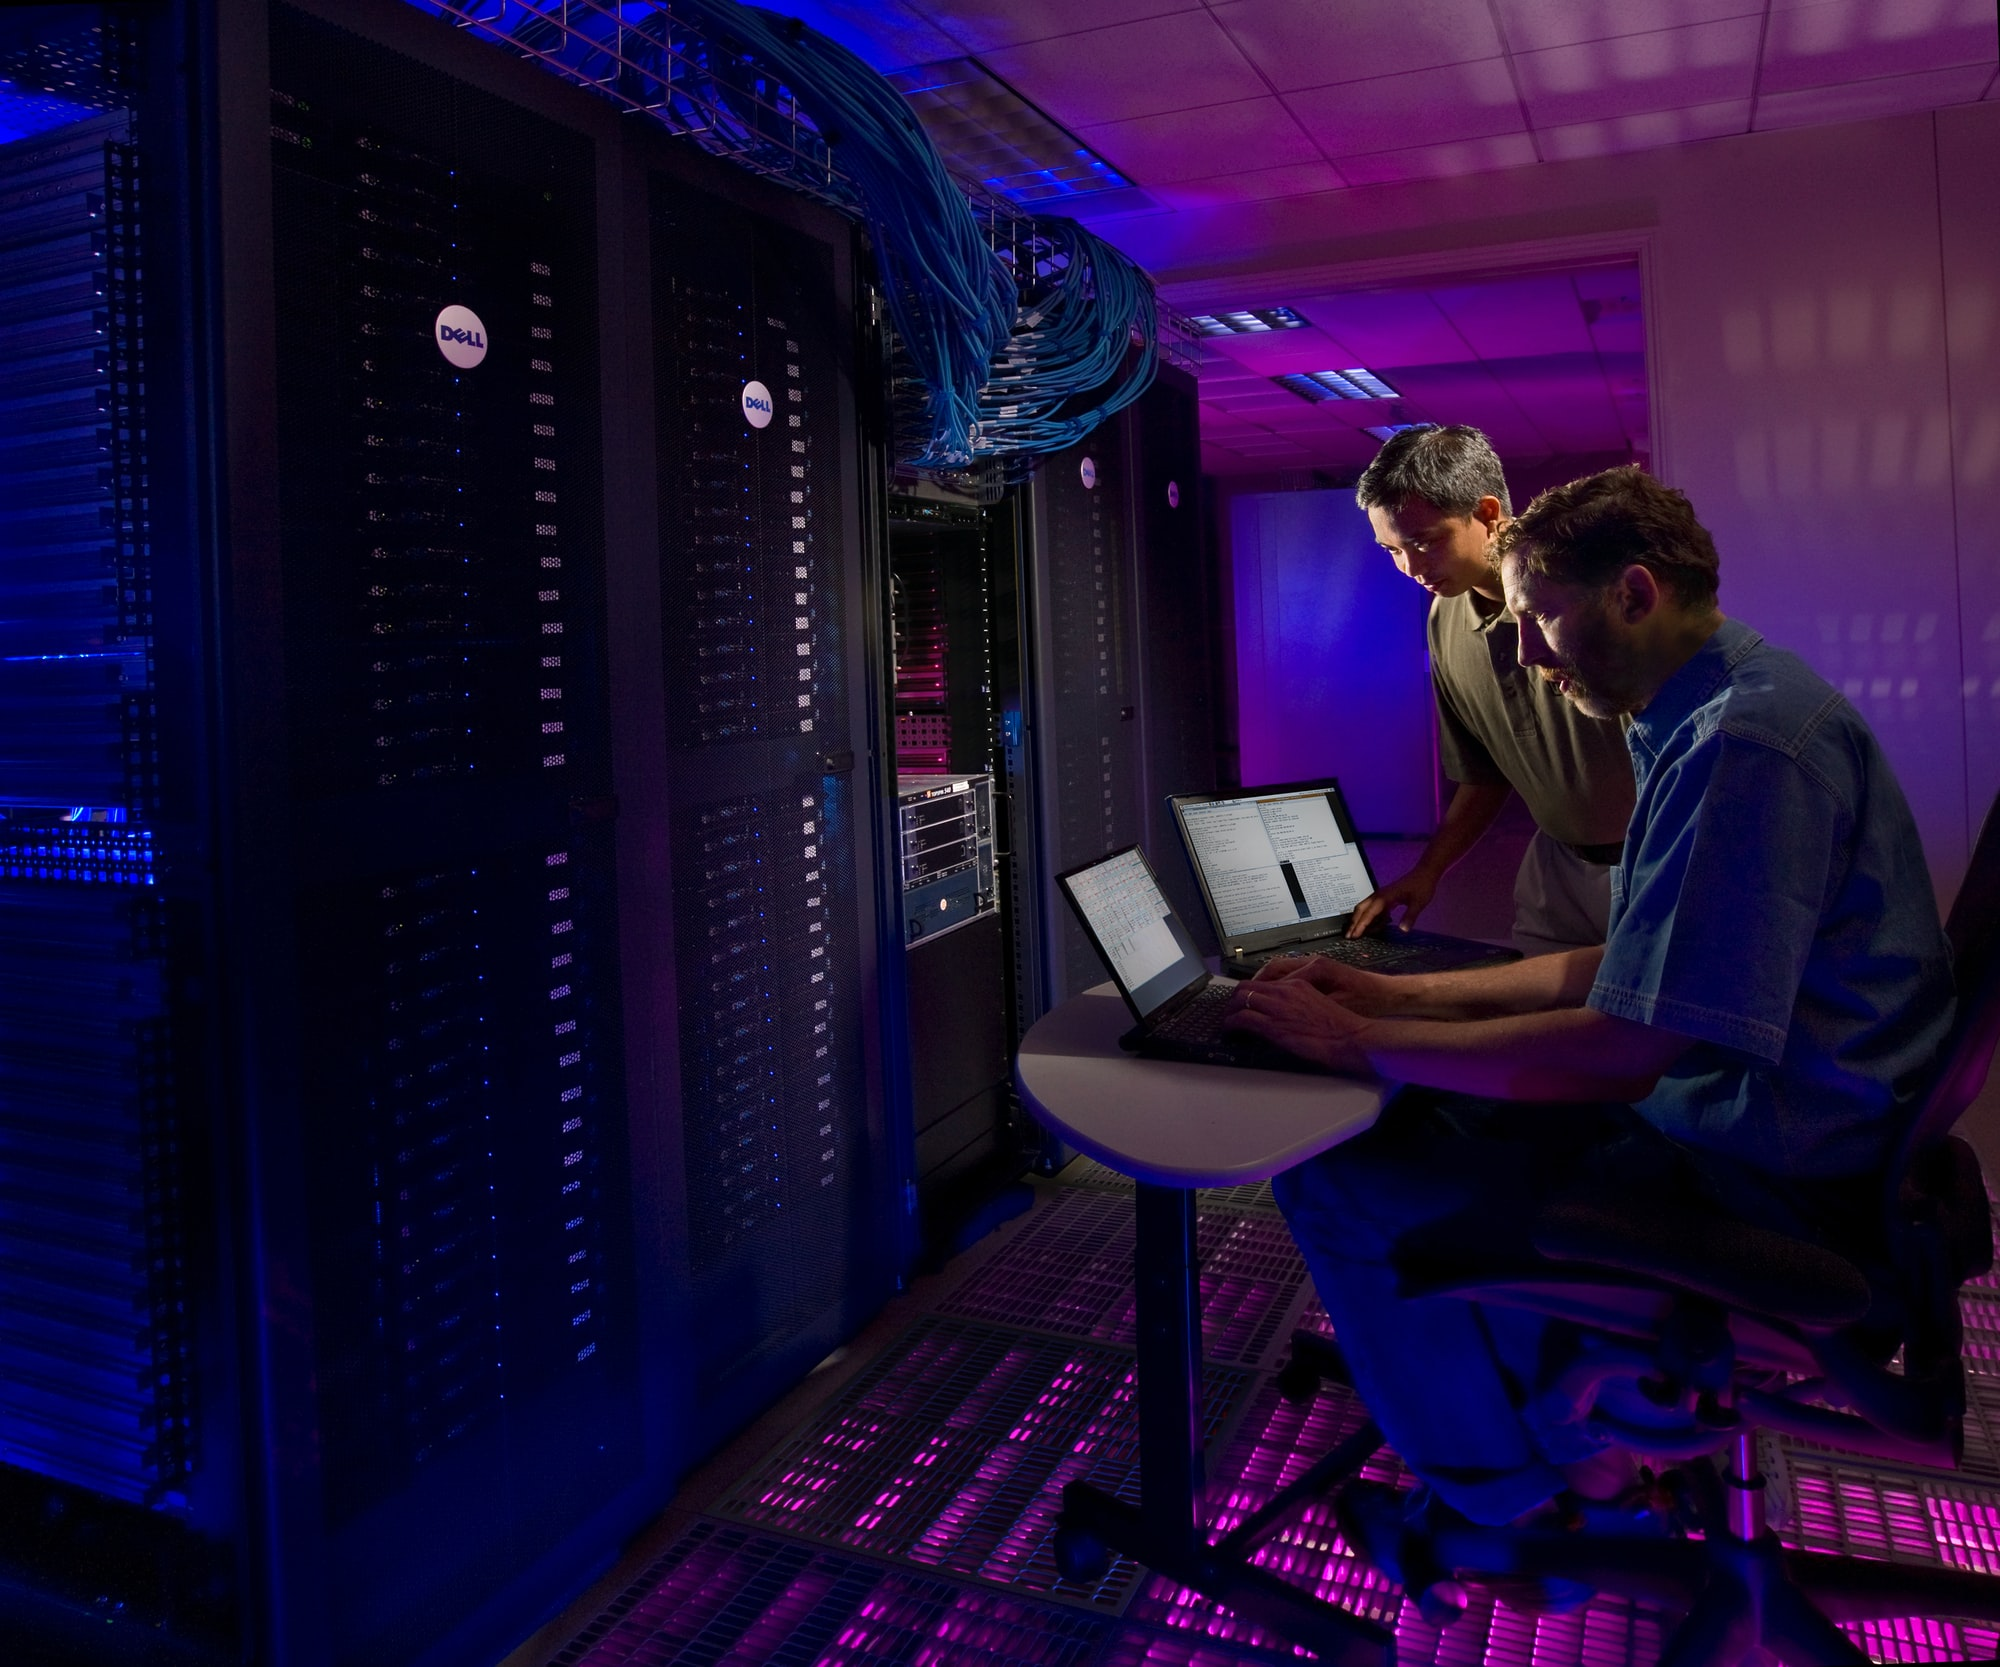 Thunderbird supercomputer at Sandia National Laboratory.